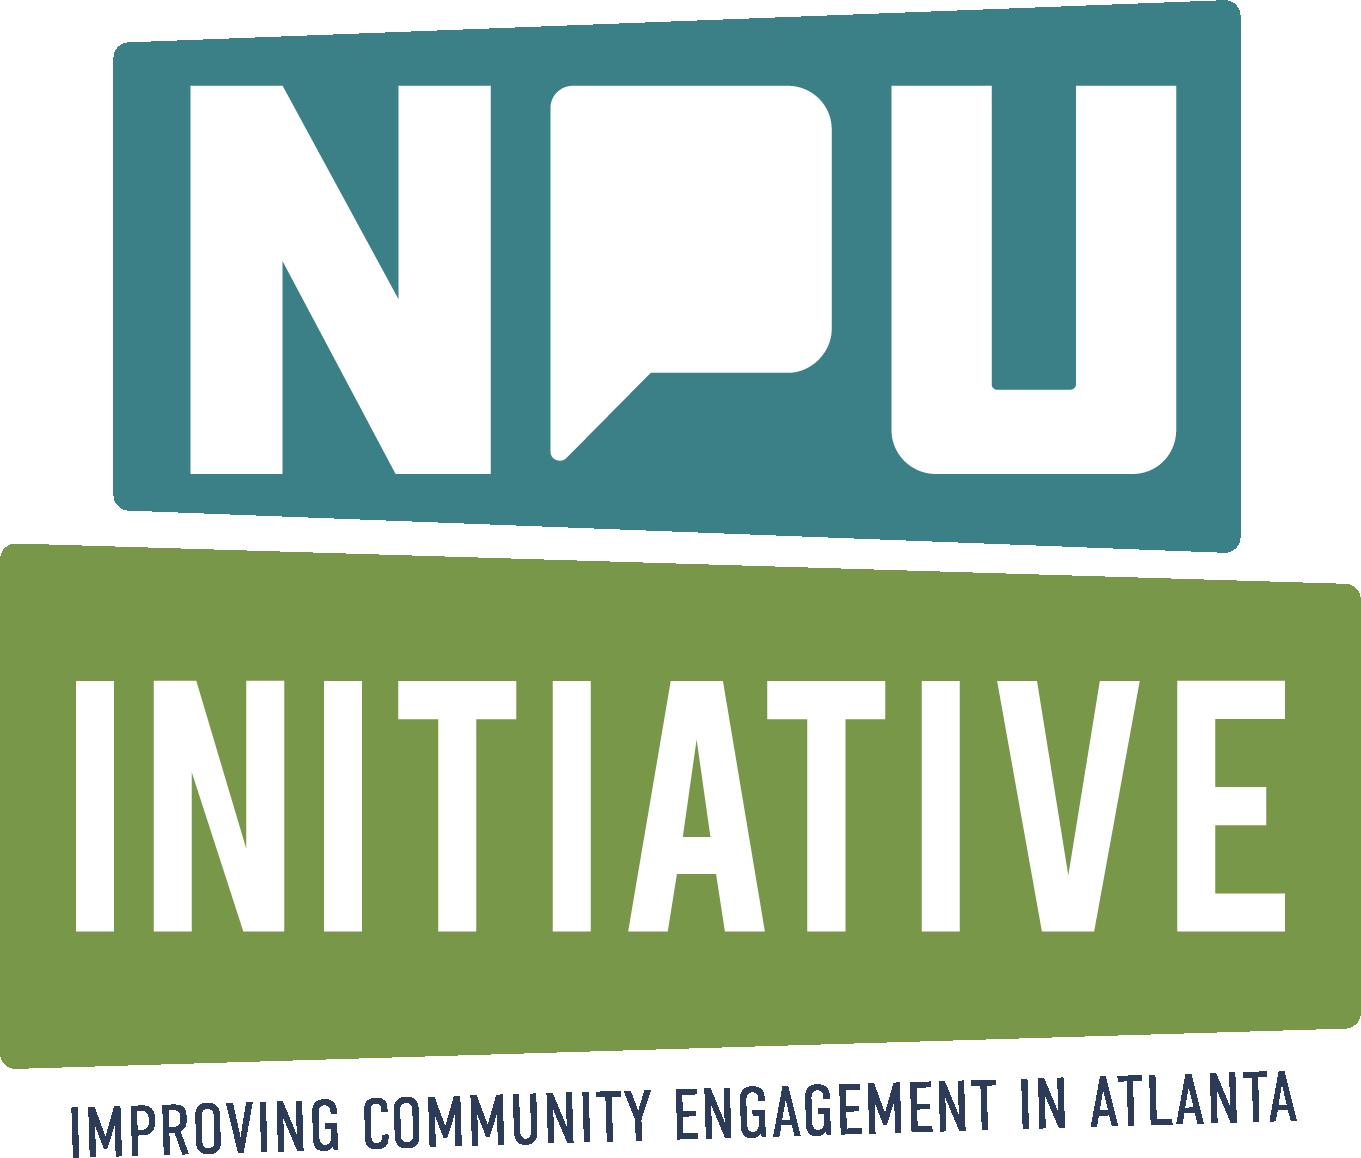 NPUInitiative_Full.png